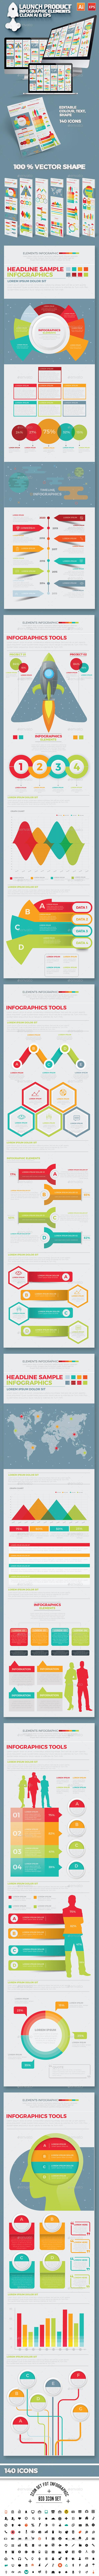 Start Up Infographic Design - Infographics